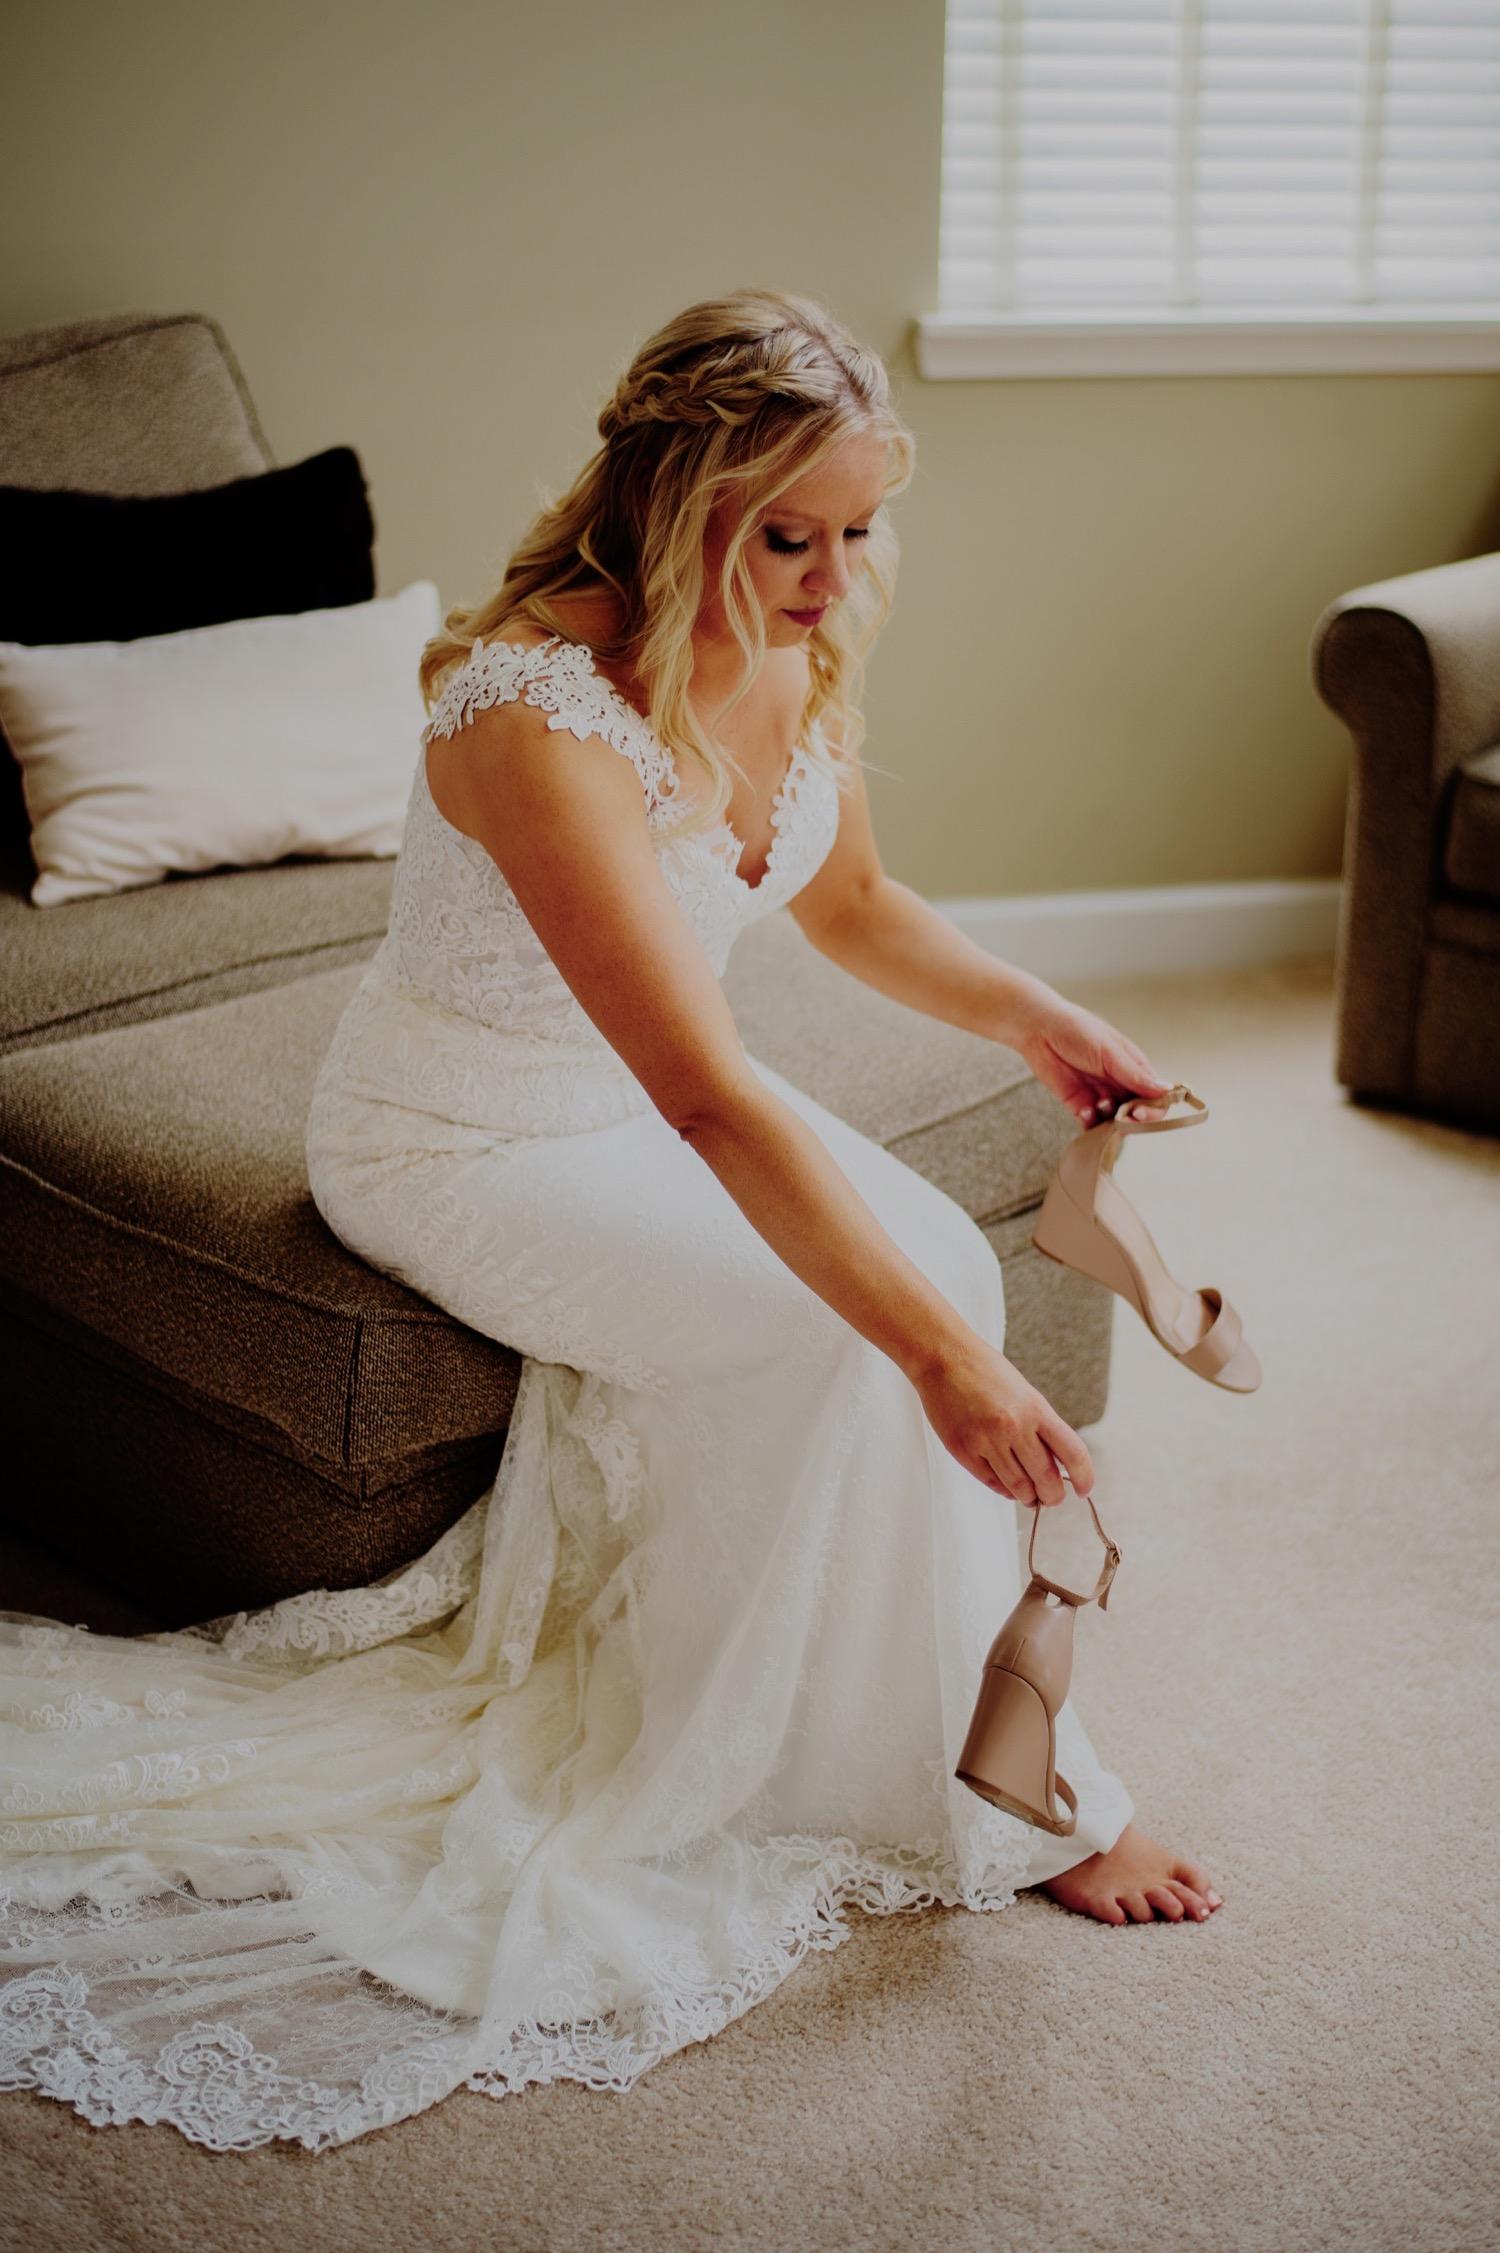 007_Watson-Wedding-Morris-Country-Club_0010.jpg